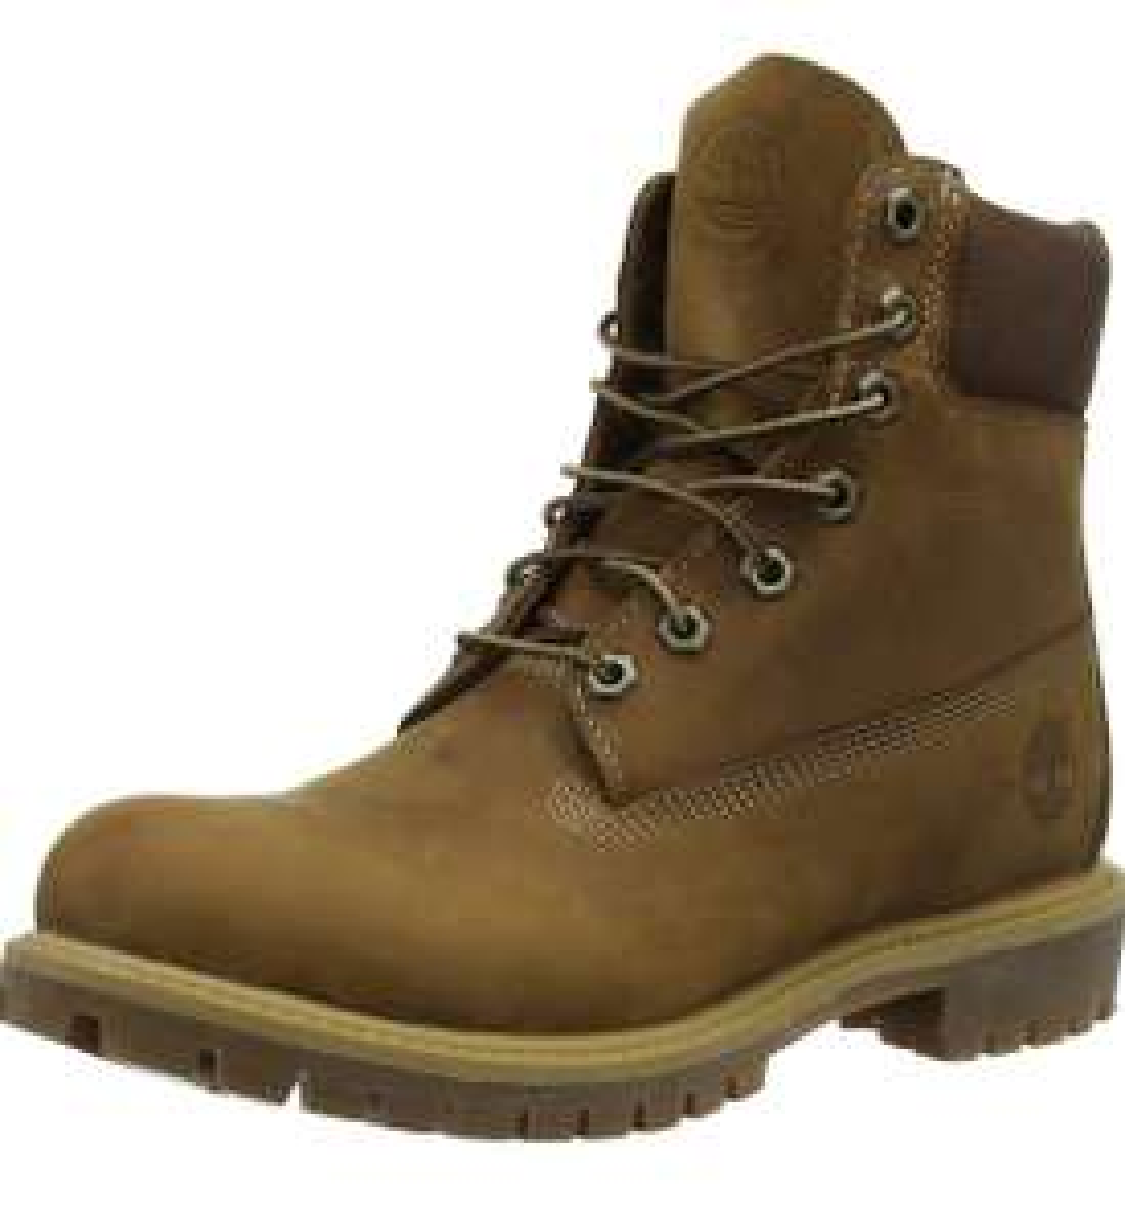 Timberland premium 6 inch boots bruin @ Amazon.de